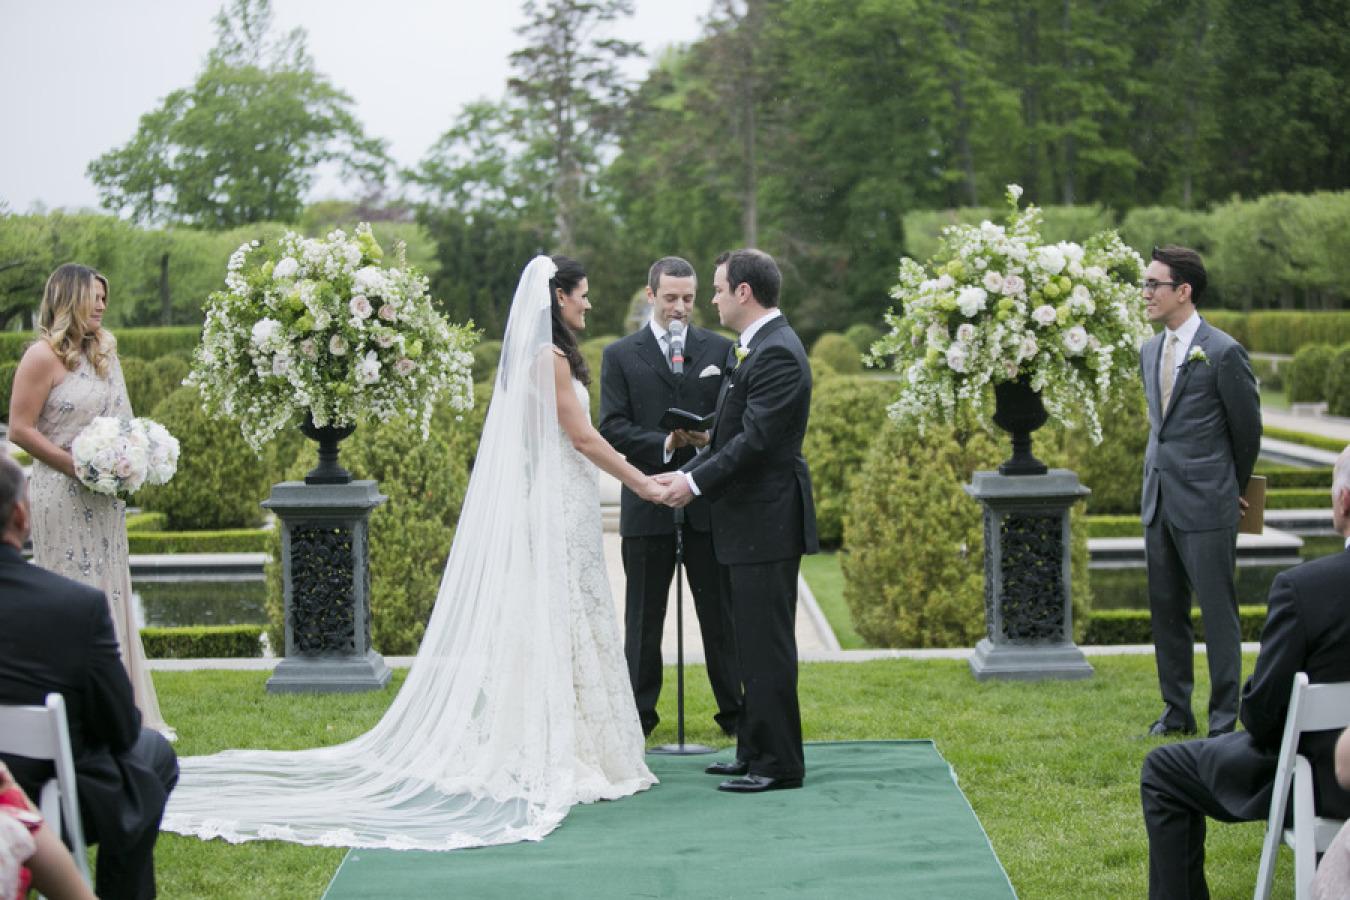 Oheka Castle Wedding from Mel Barlow + DM Events